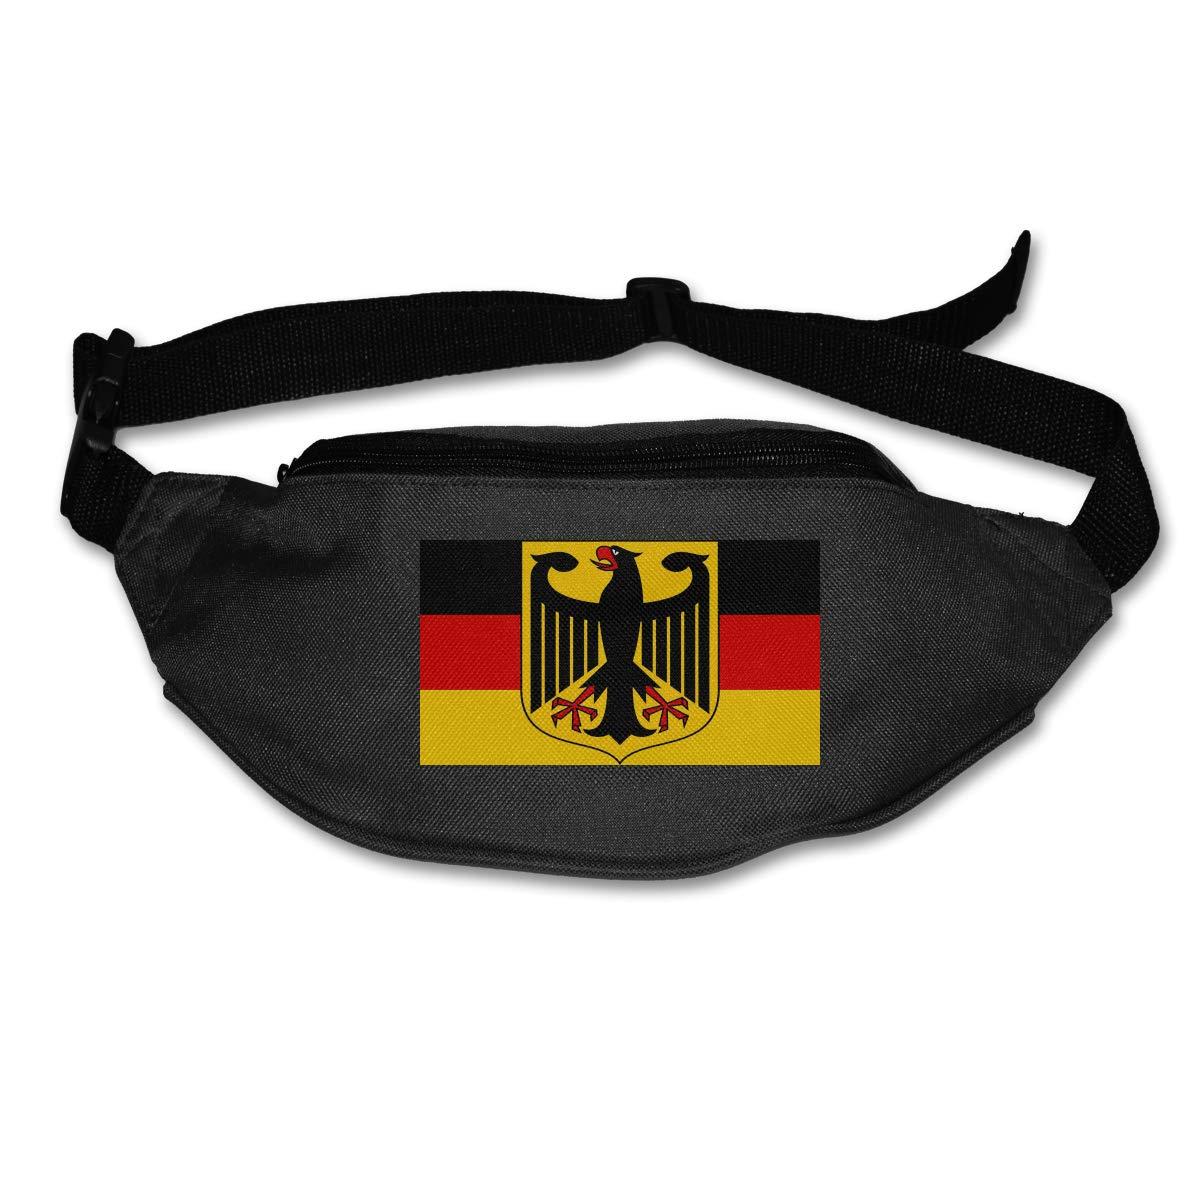 Deutschland Germany And Flag Sport Waist Bag Fanny Pack Adjustable For Run